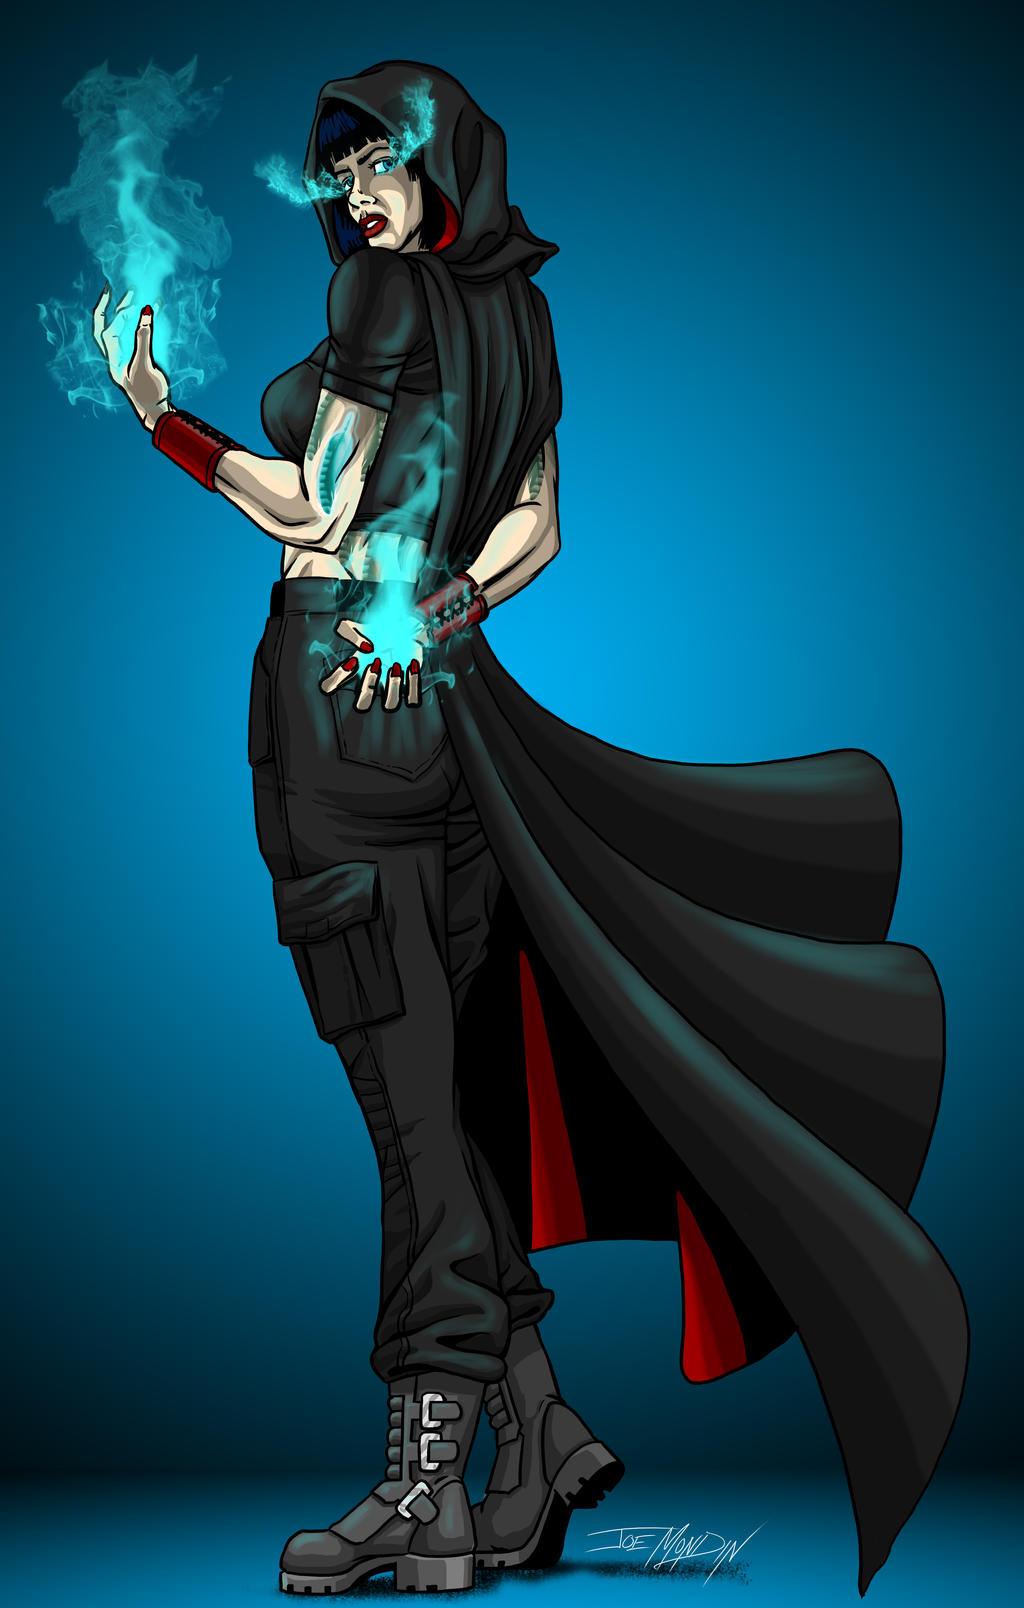 Raven by JoeGrafix